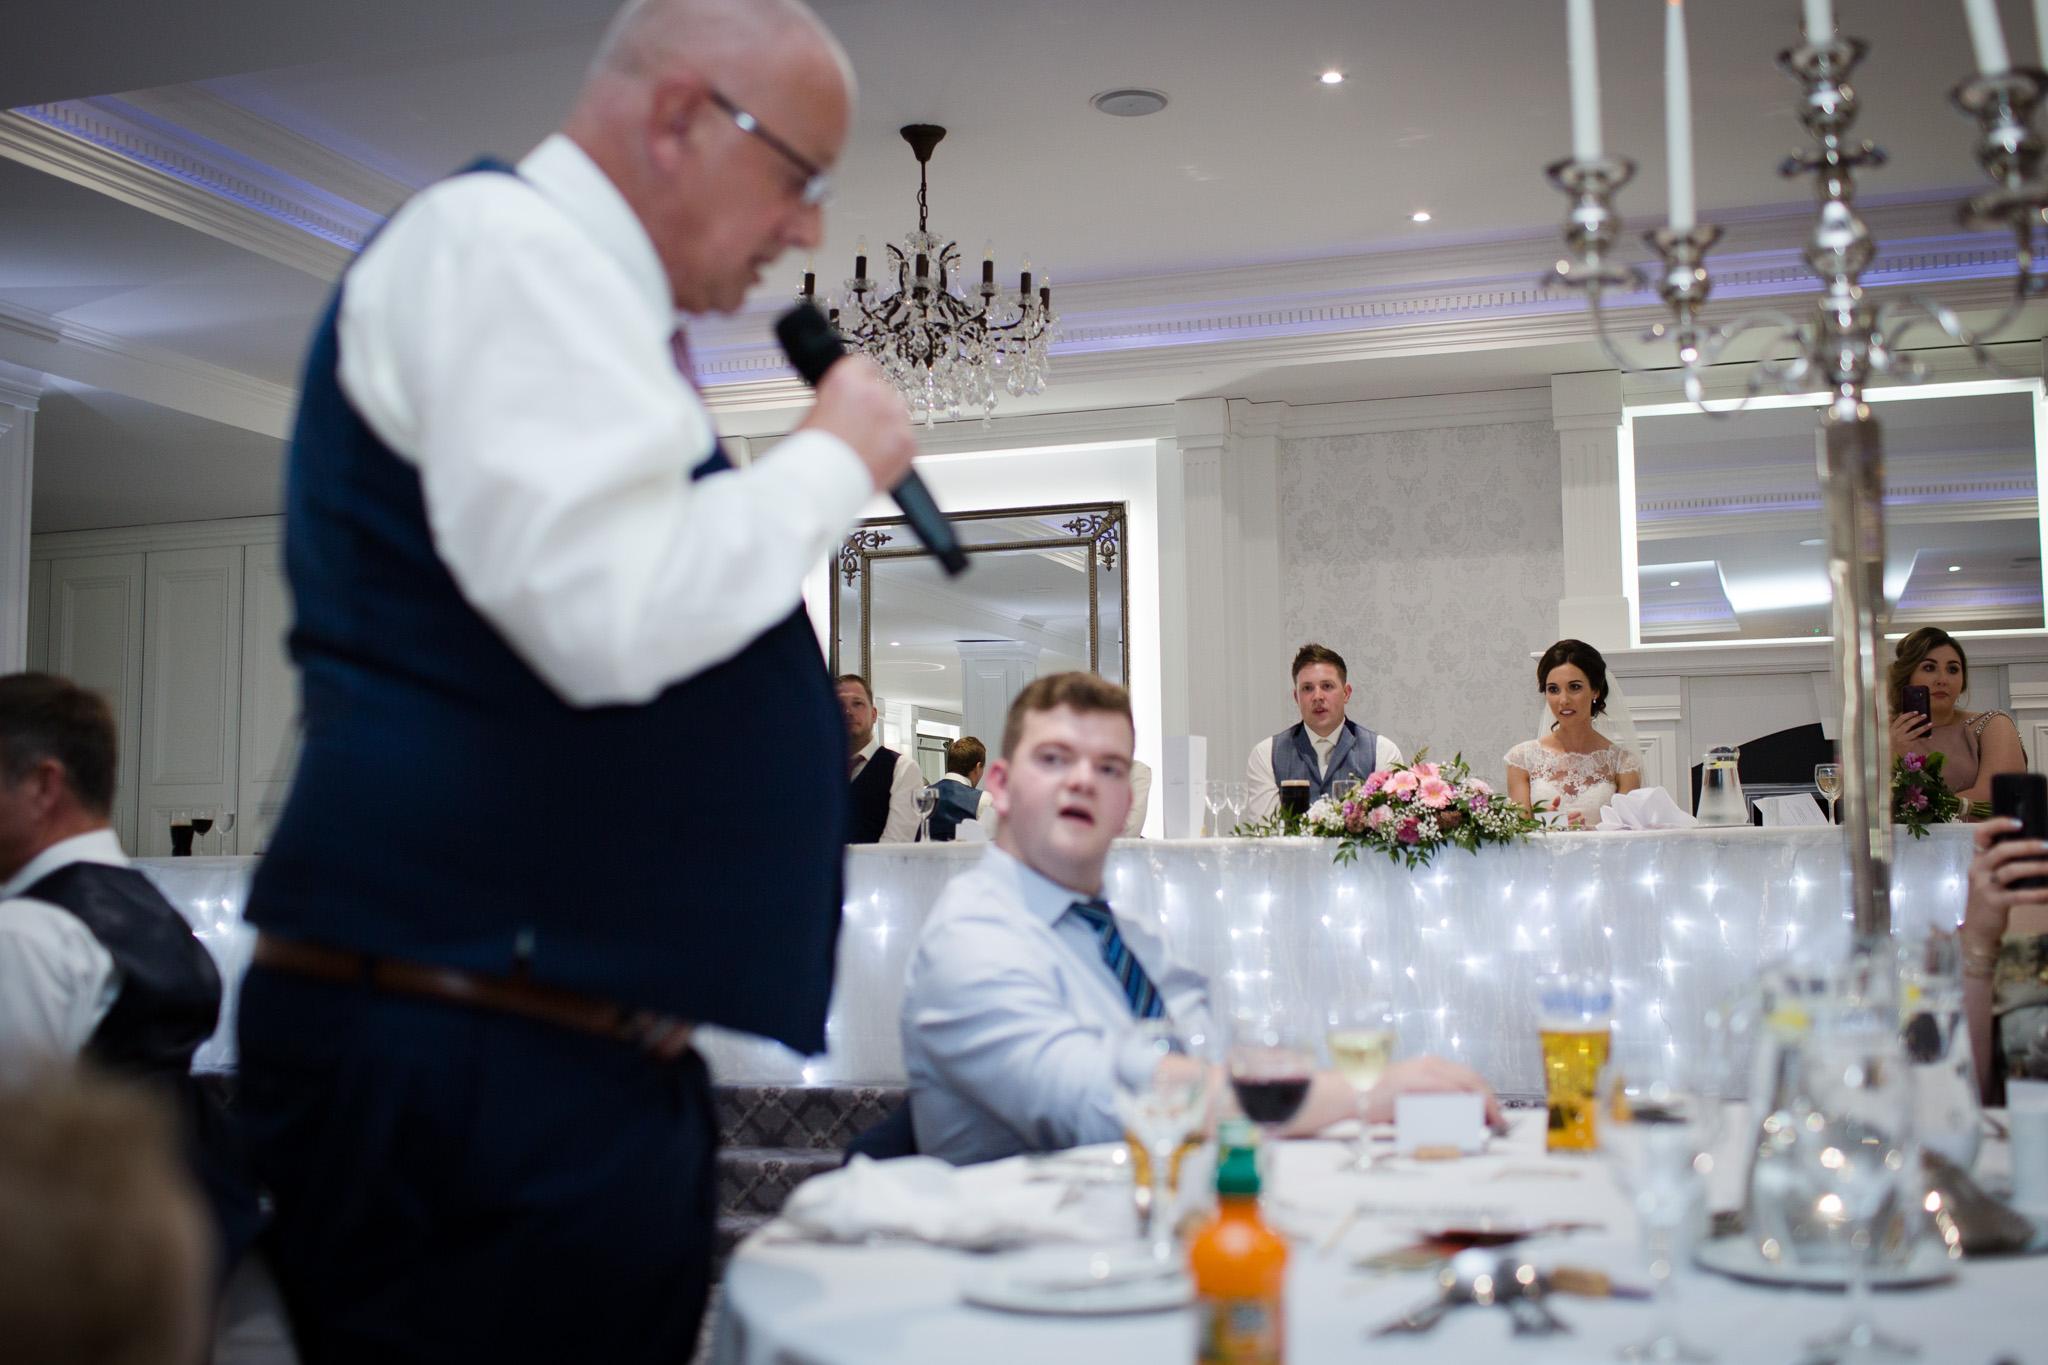 Mark_Barnes_Northern_Ireland_Wedding_Photography_Leighinmohr-house-hotel-ballymena_Wedding_Photography-55.jpg